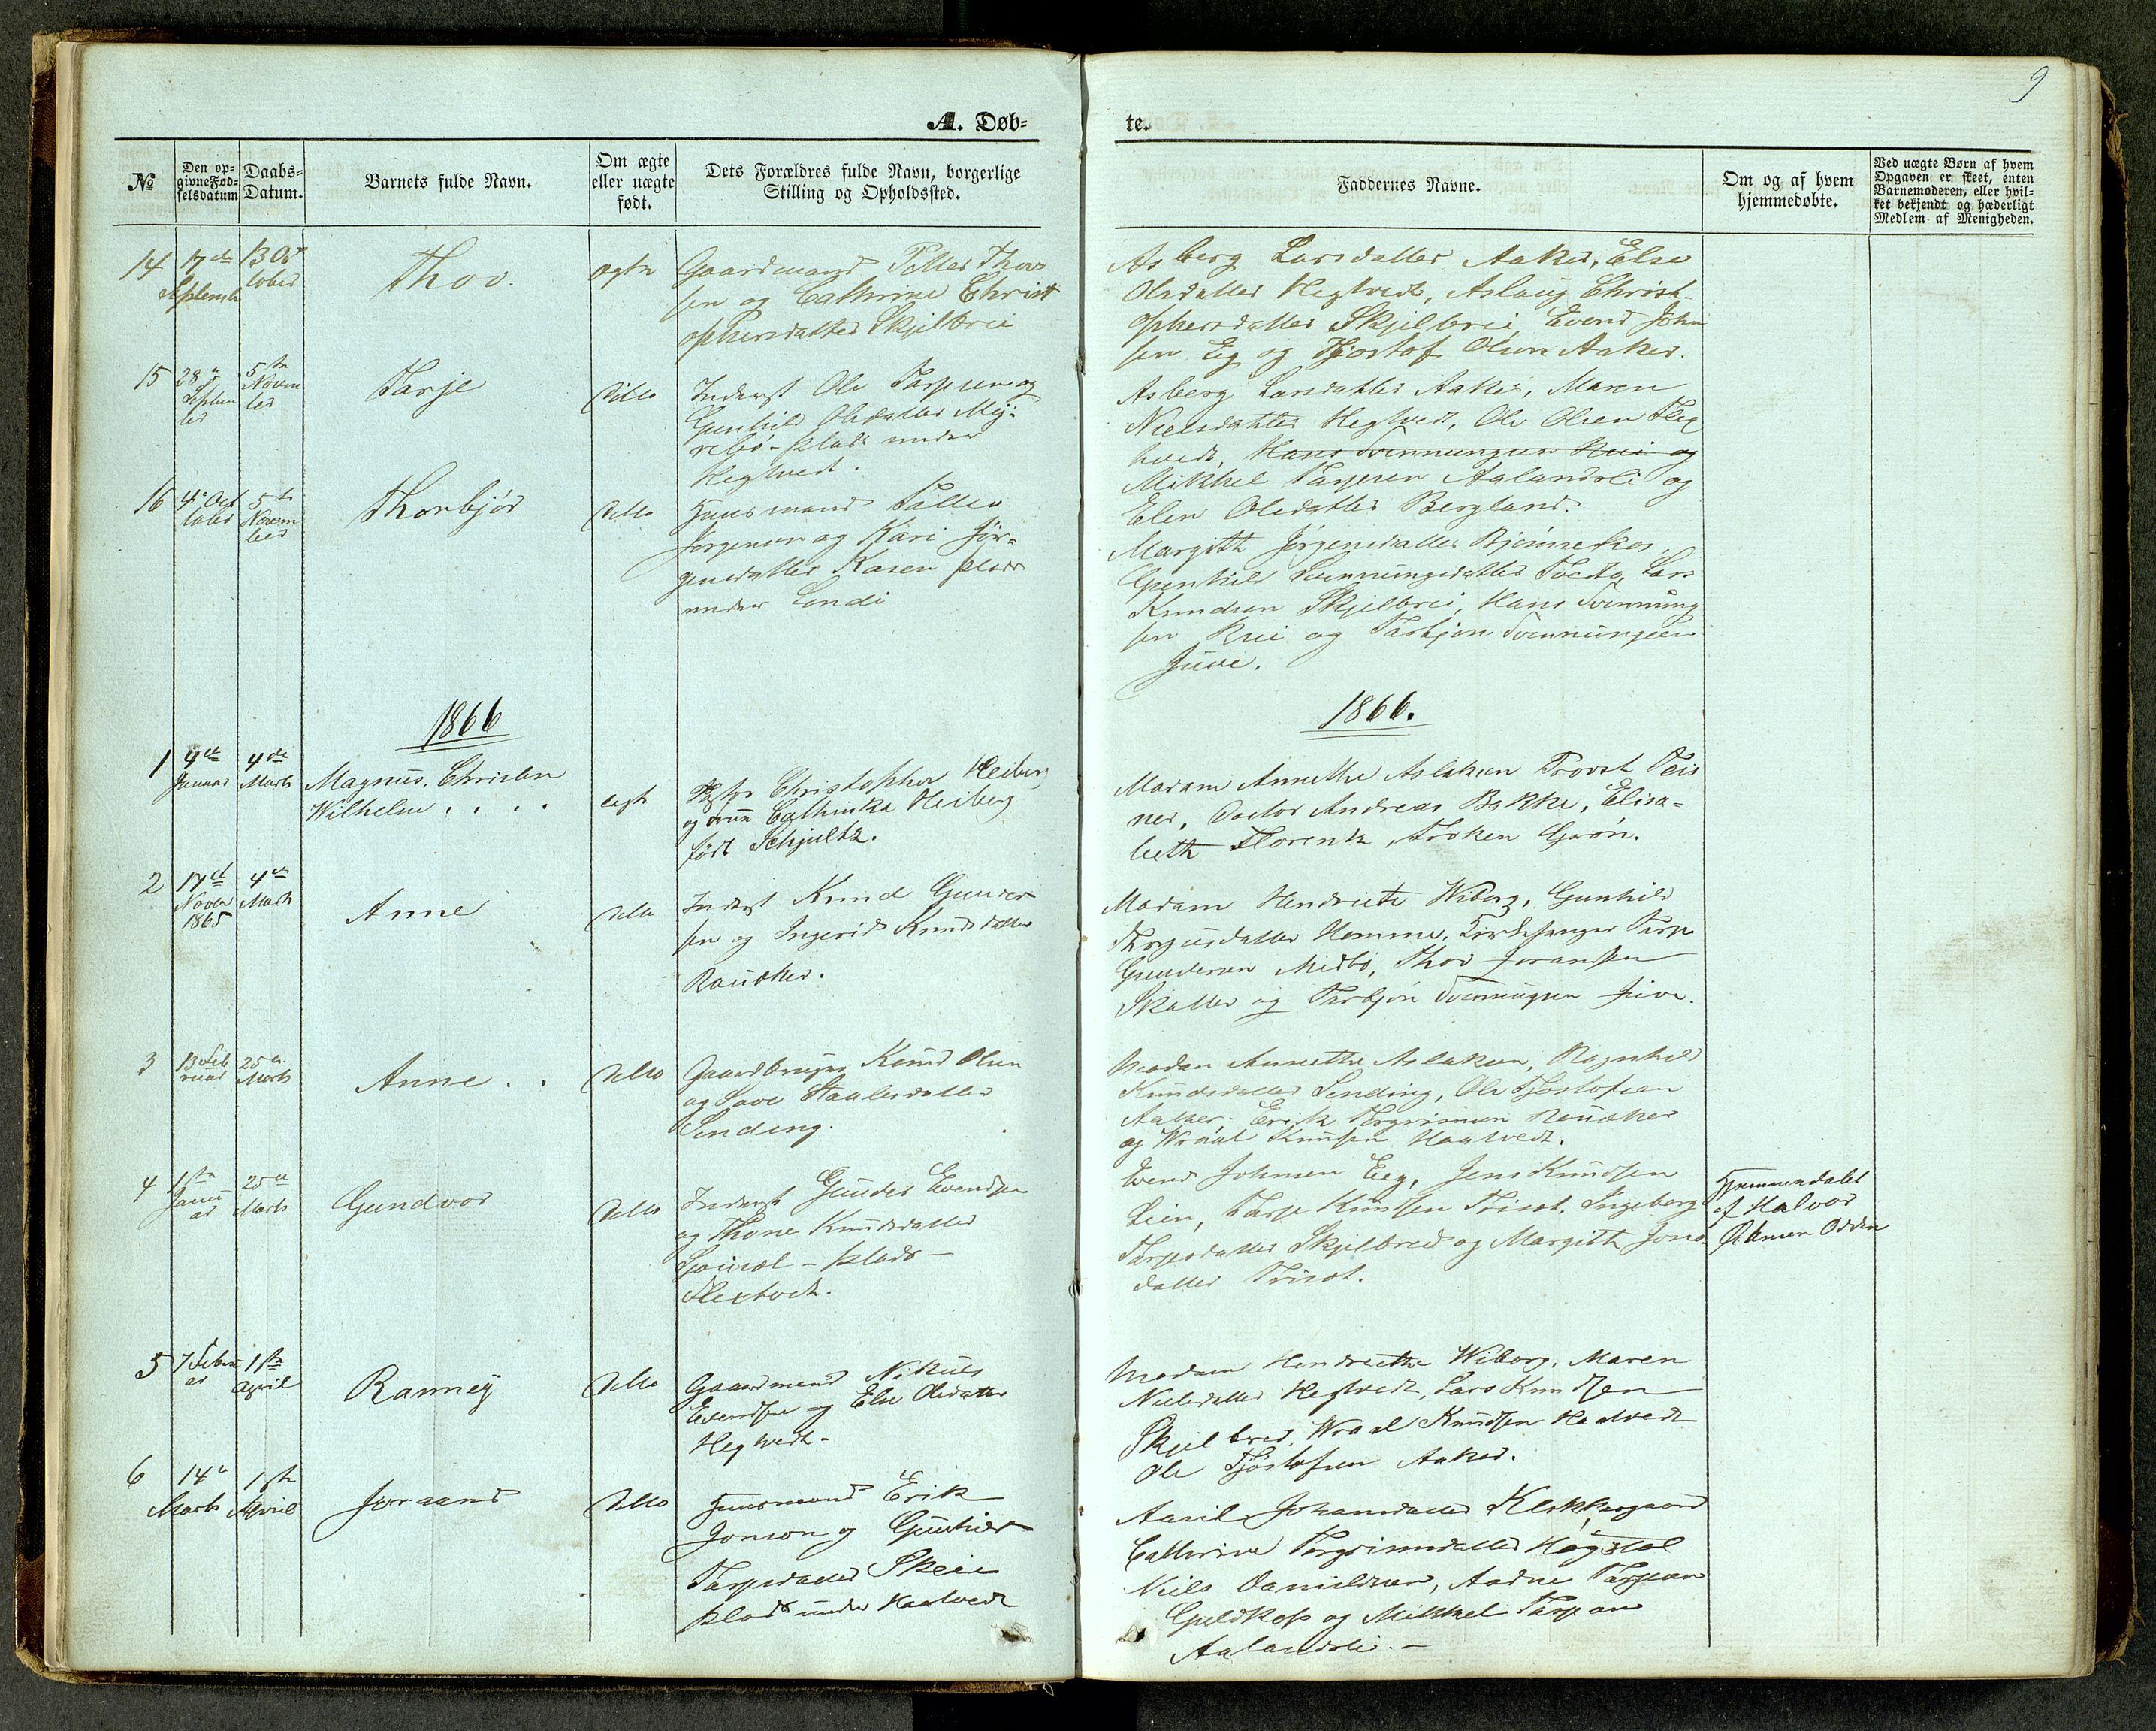 SAKO, Lårdal kirkebøker, G/Ga/L0002: Klokkerbok nr. I 2, 1861-1890, s. 9